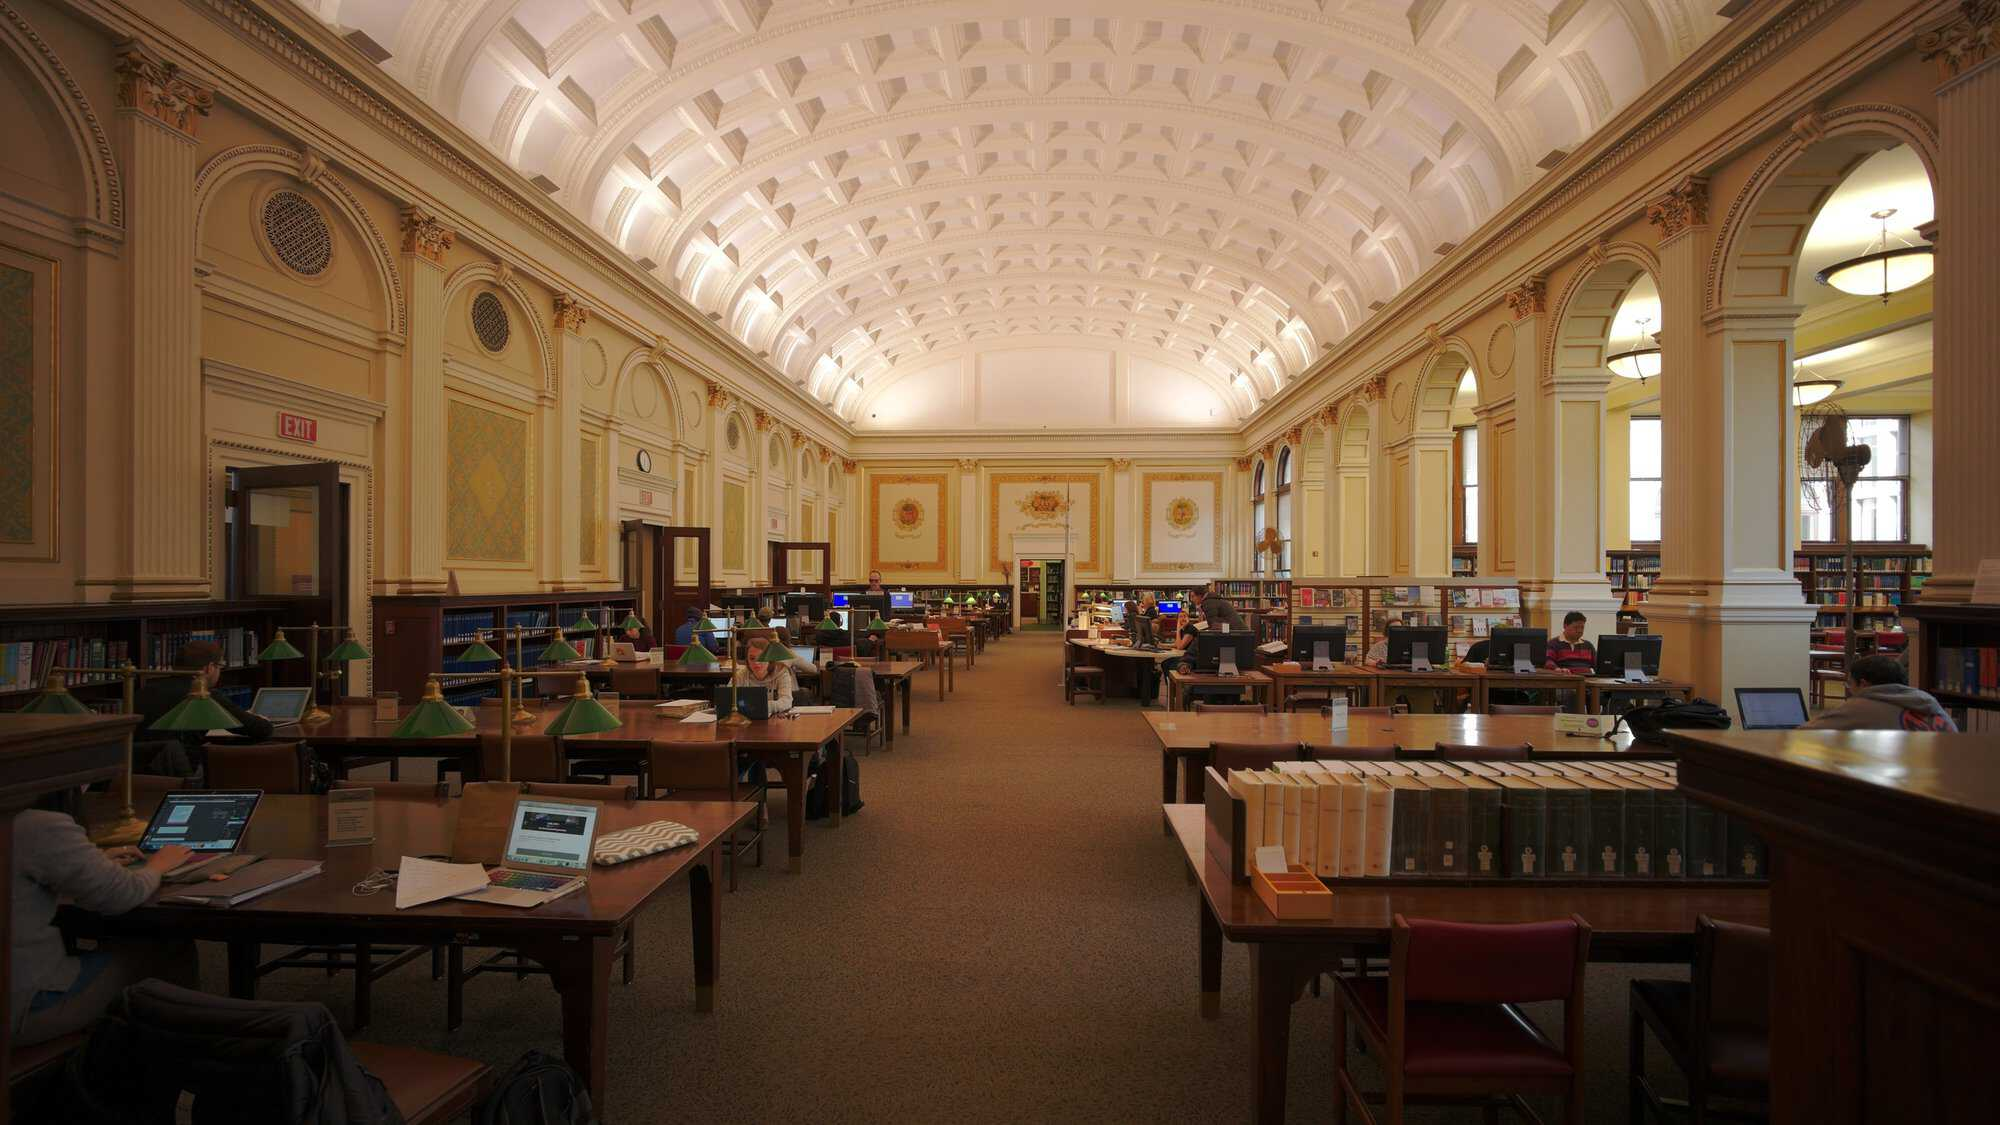 Carnegie_Library_of_Pittsburgh-Interior.jpg